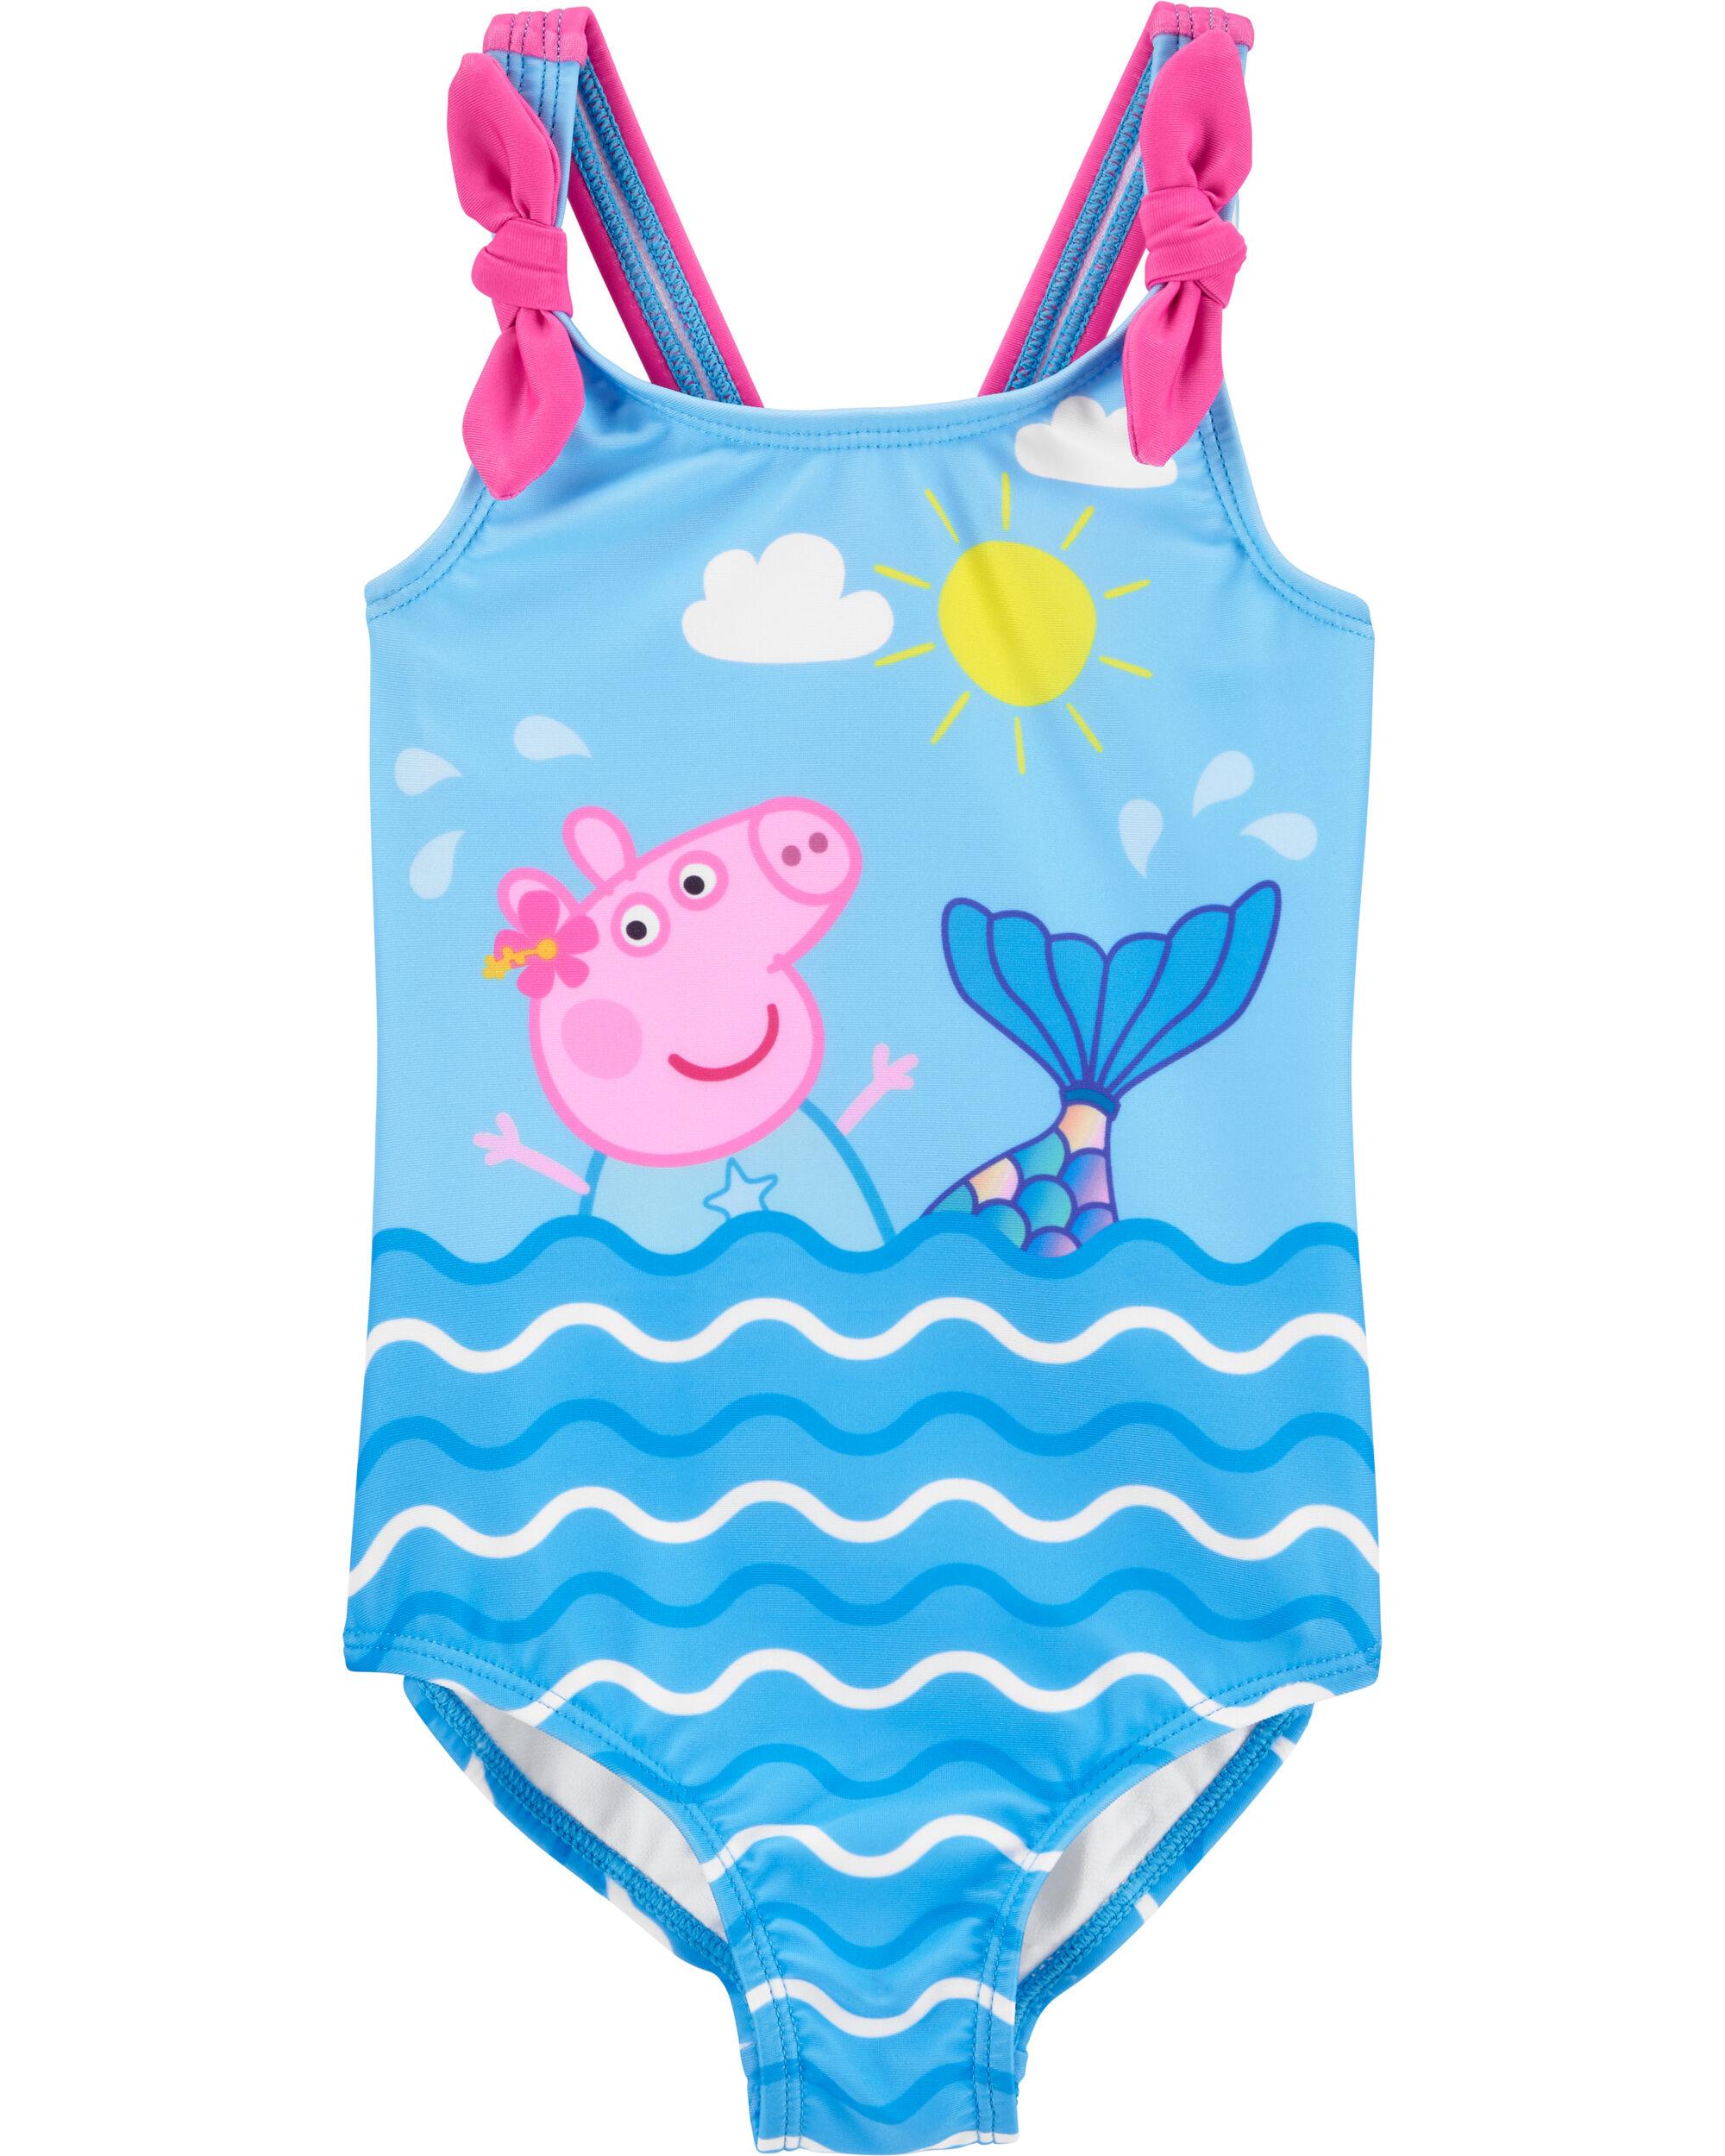 Peppa Pig Girls Swimsuit